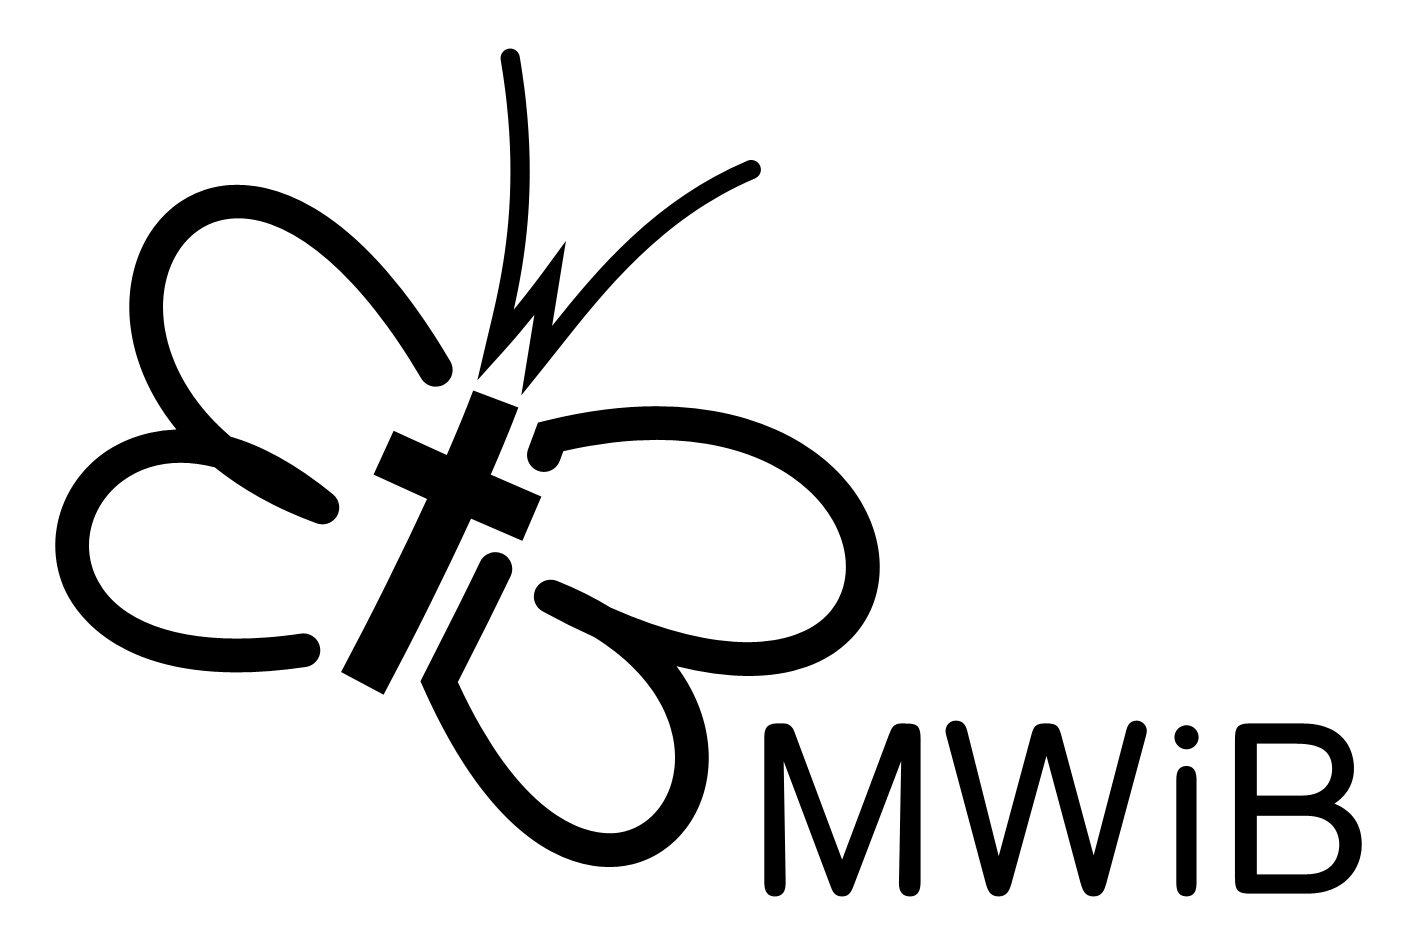 mwib logo blk 300